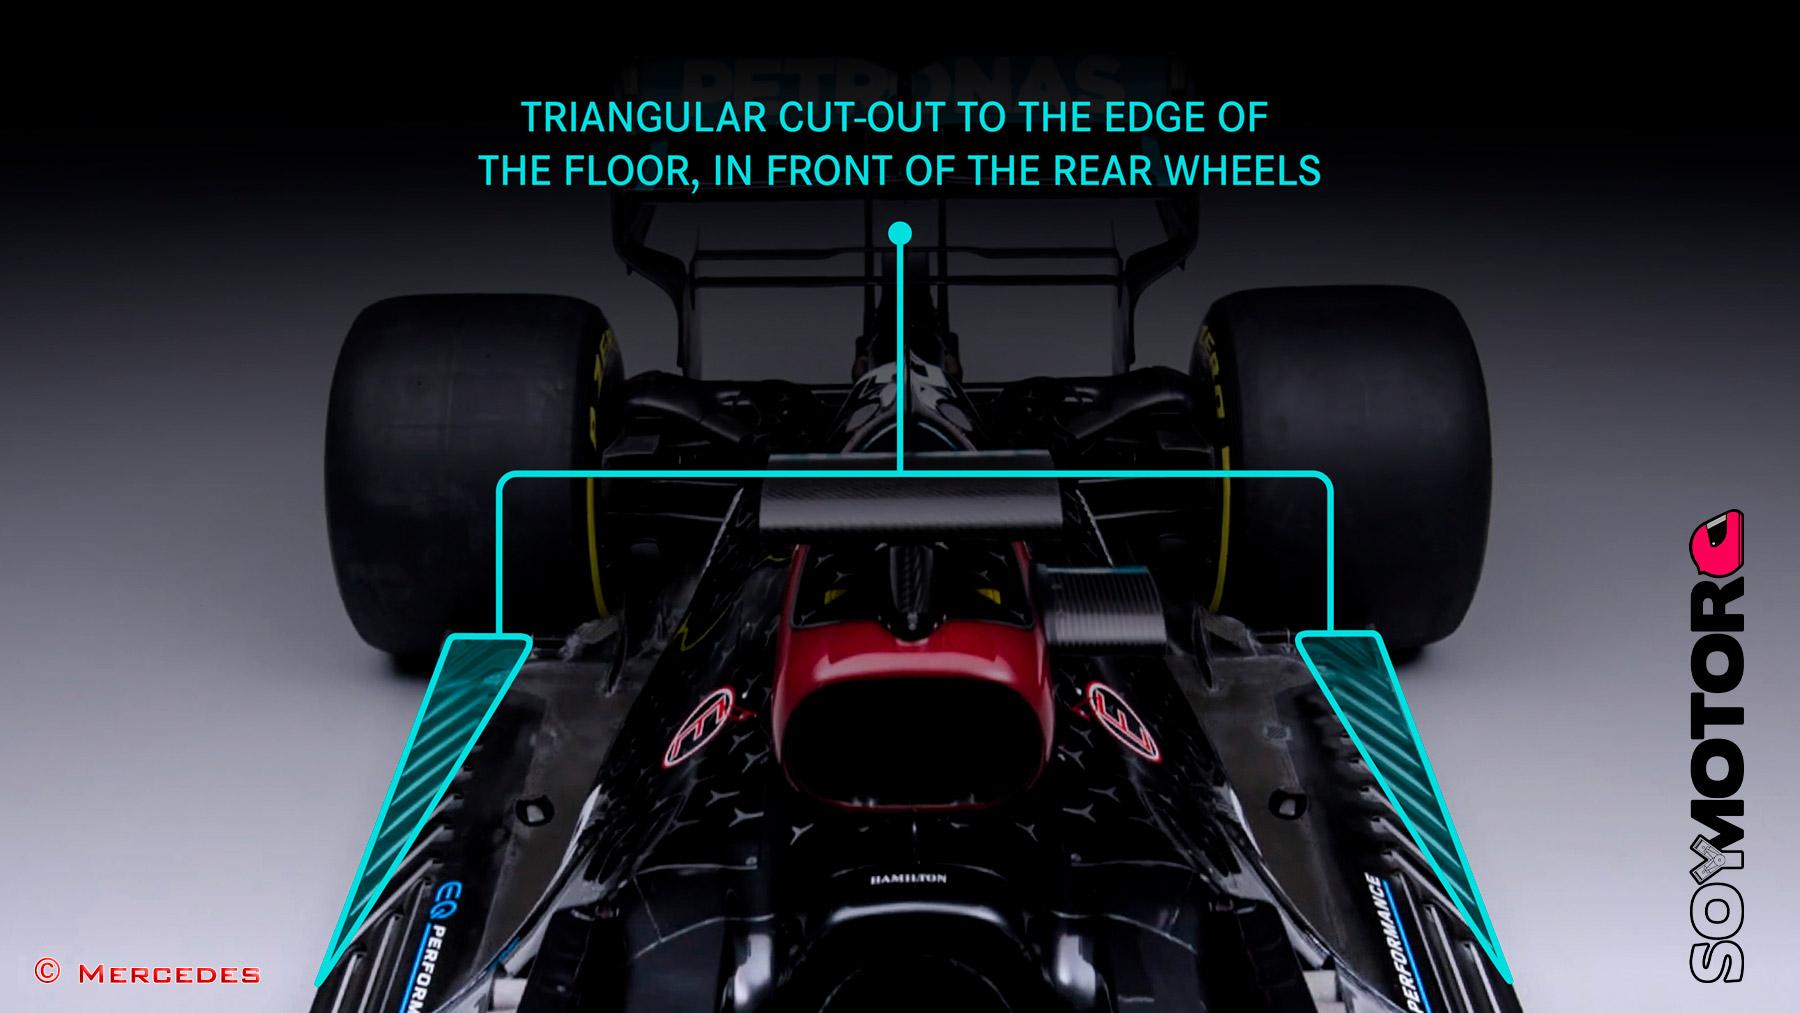 mercedes-aerodinamica-corte-suelo-soymotor.jpg